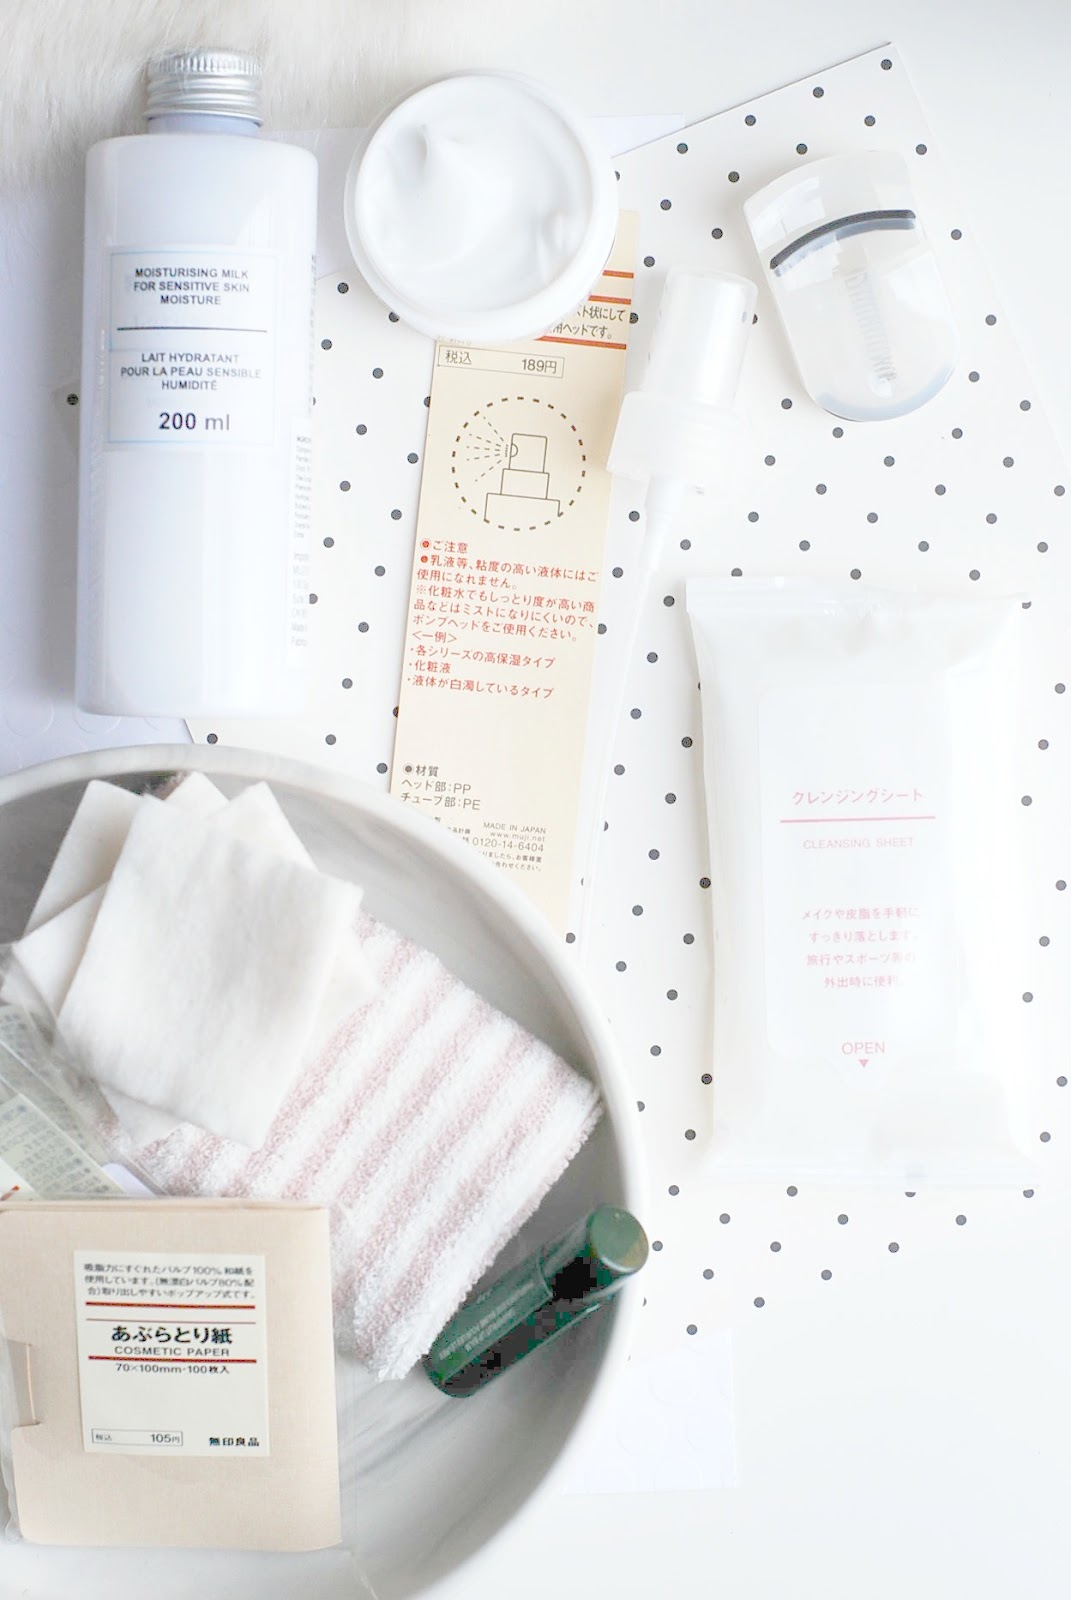 MUJI Cleansing Oil for Sensitive Skin review